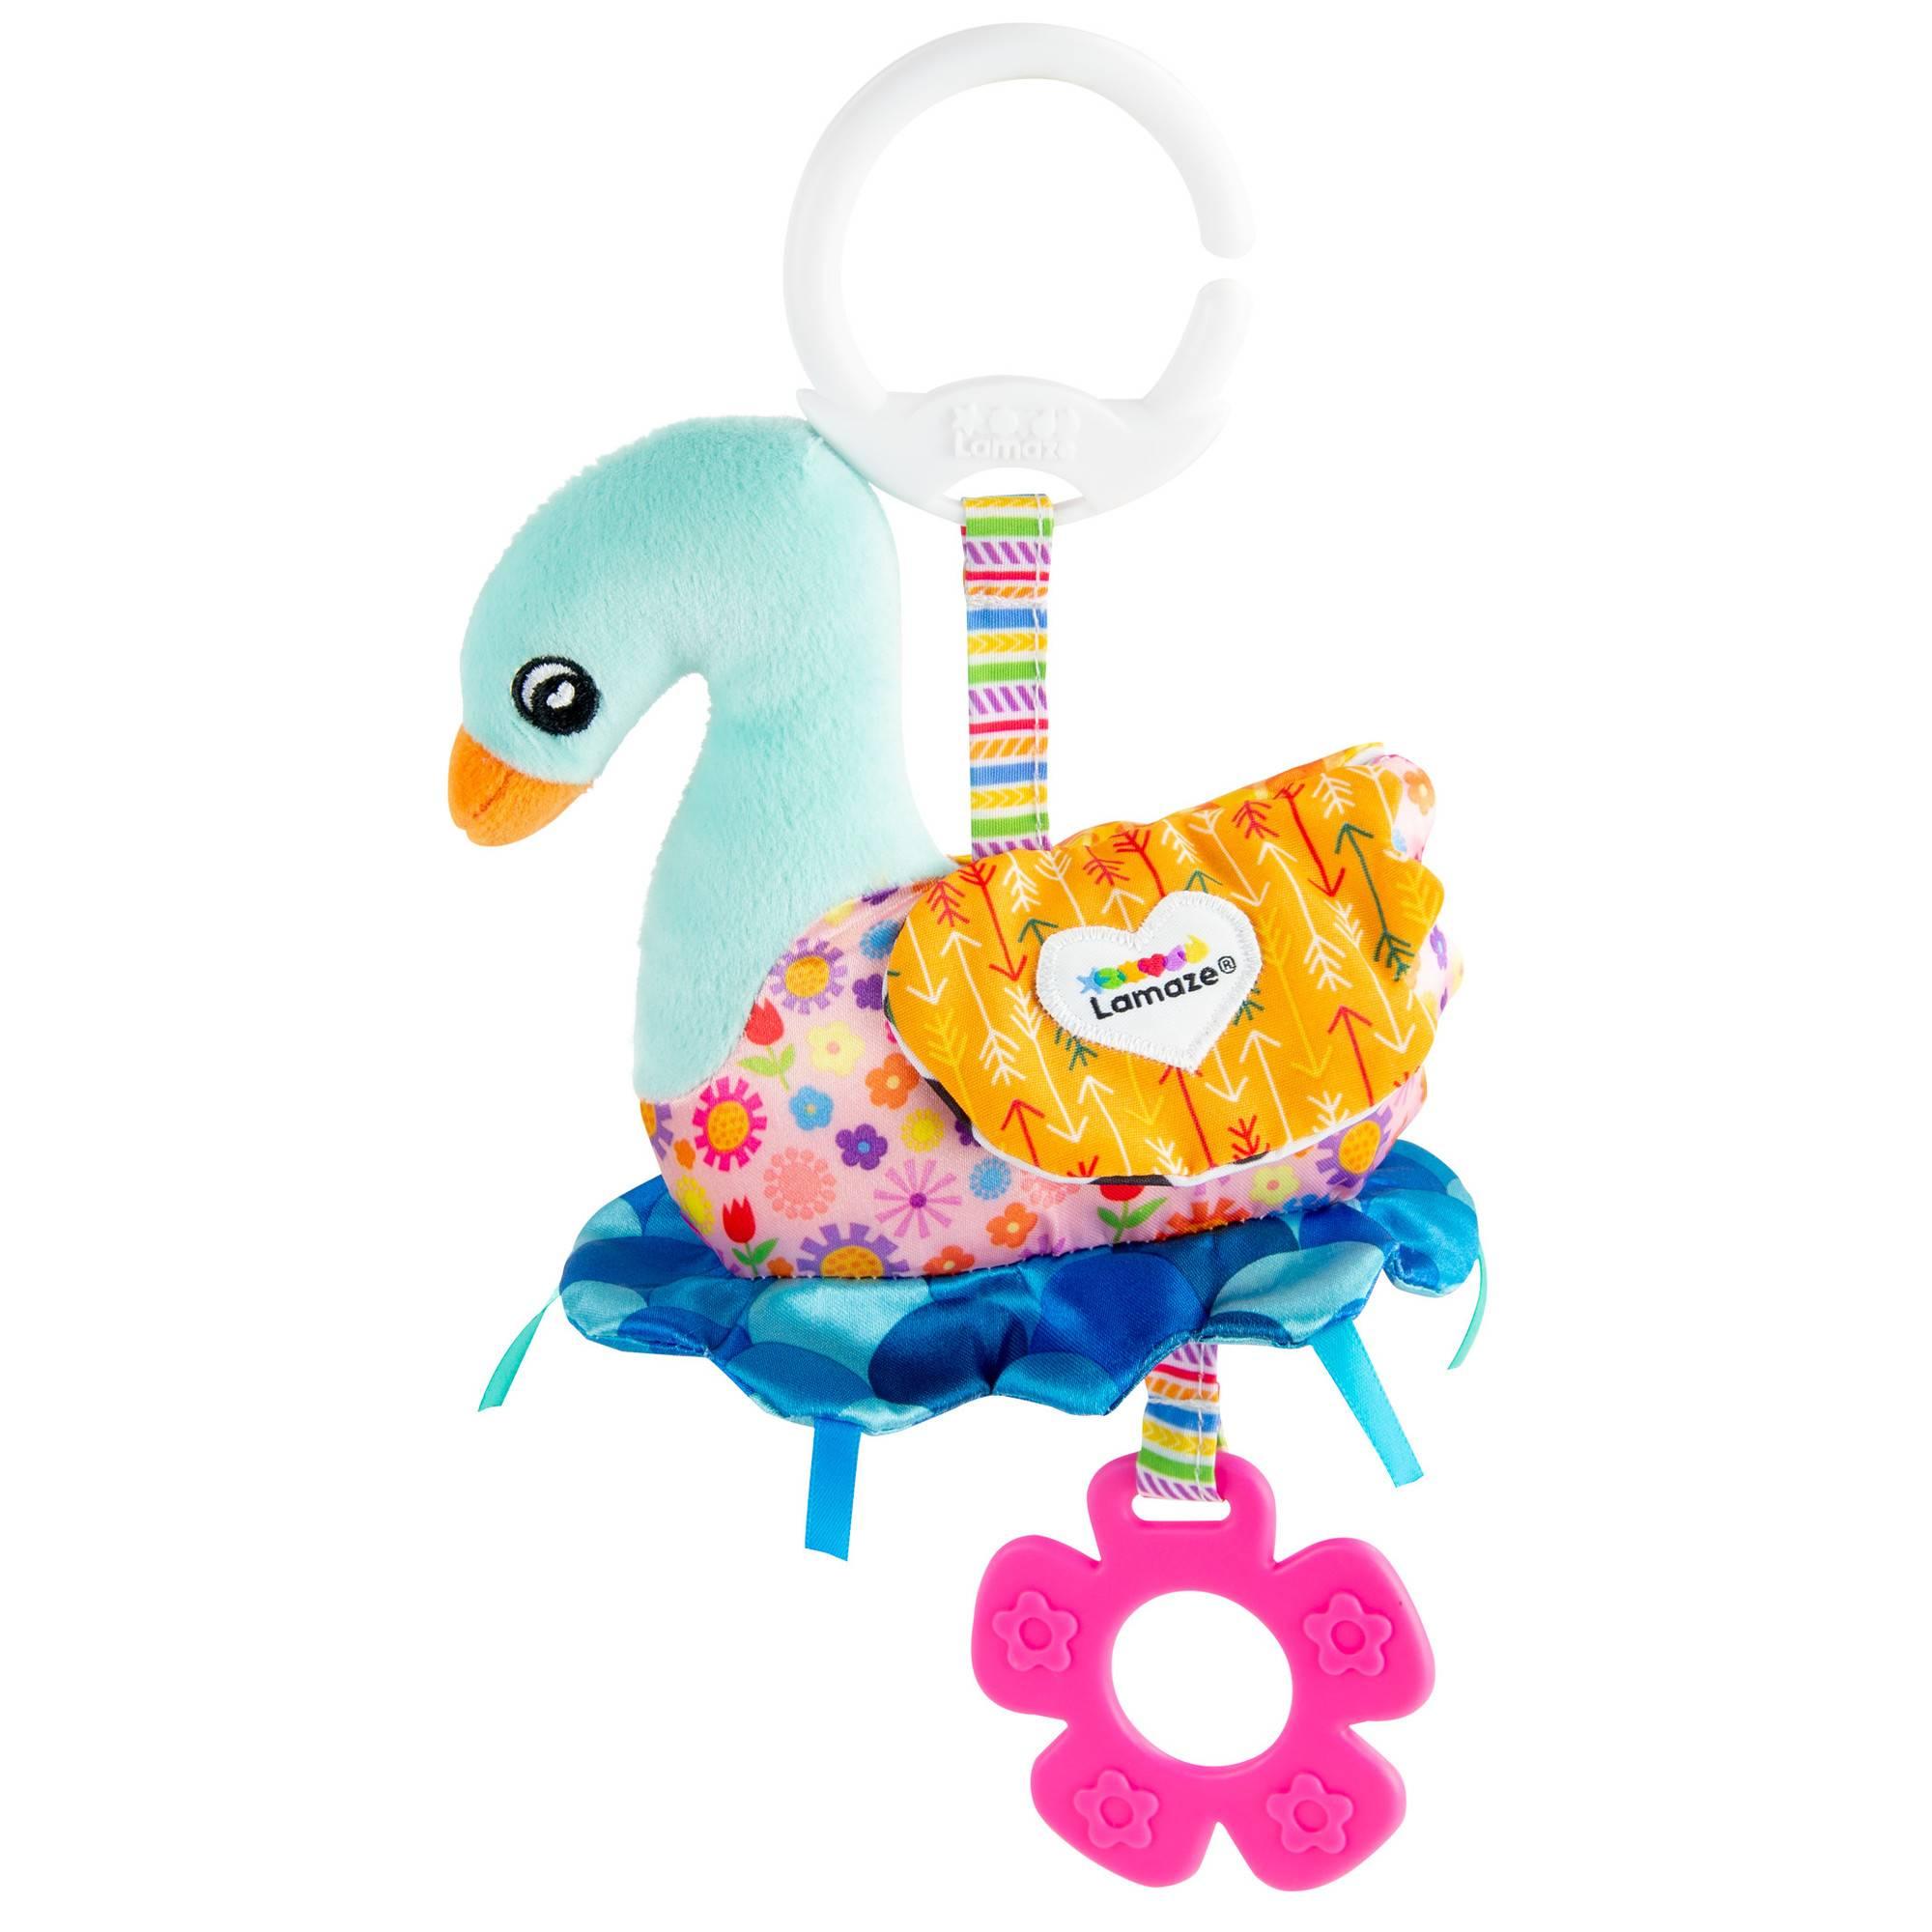 Svane – On-the-Go Babylegetøj